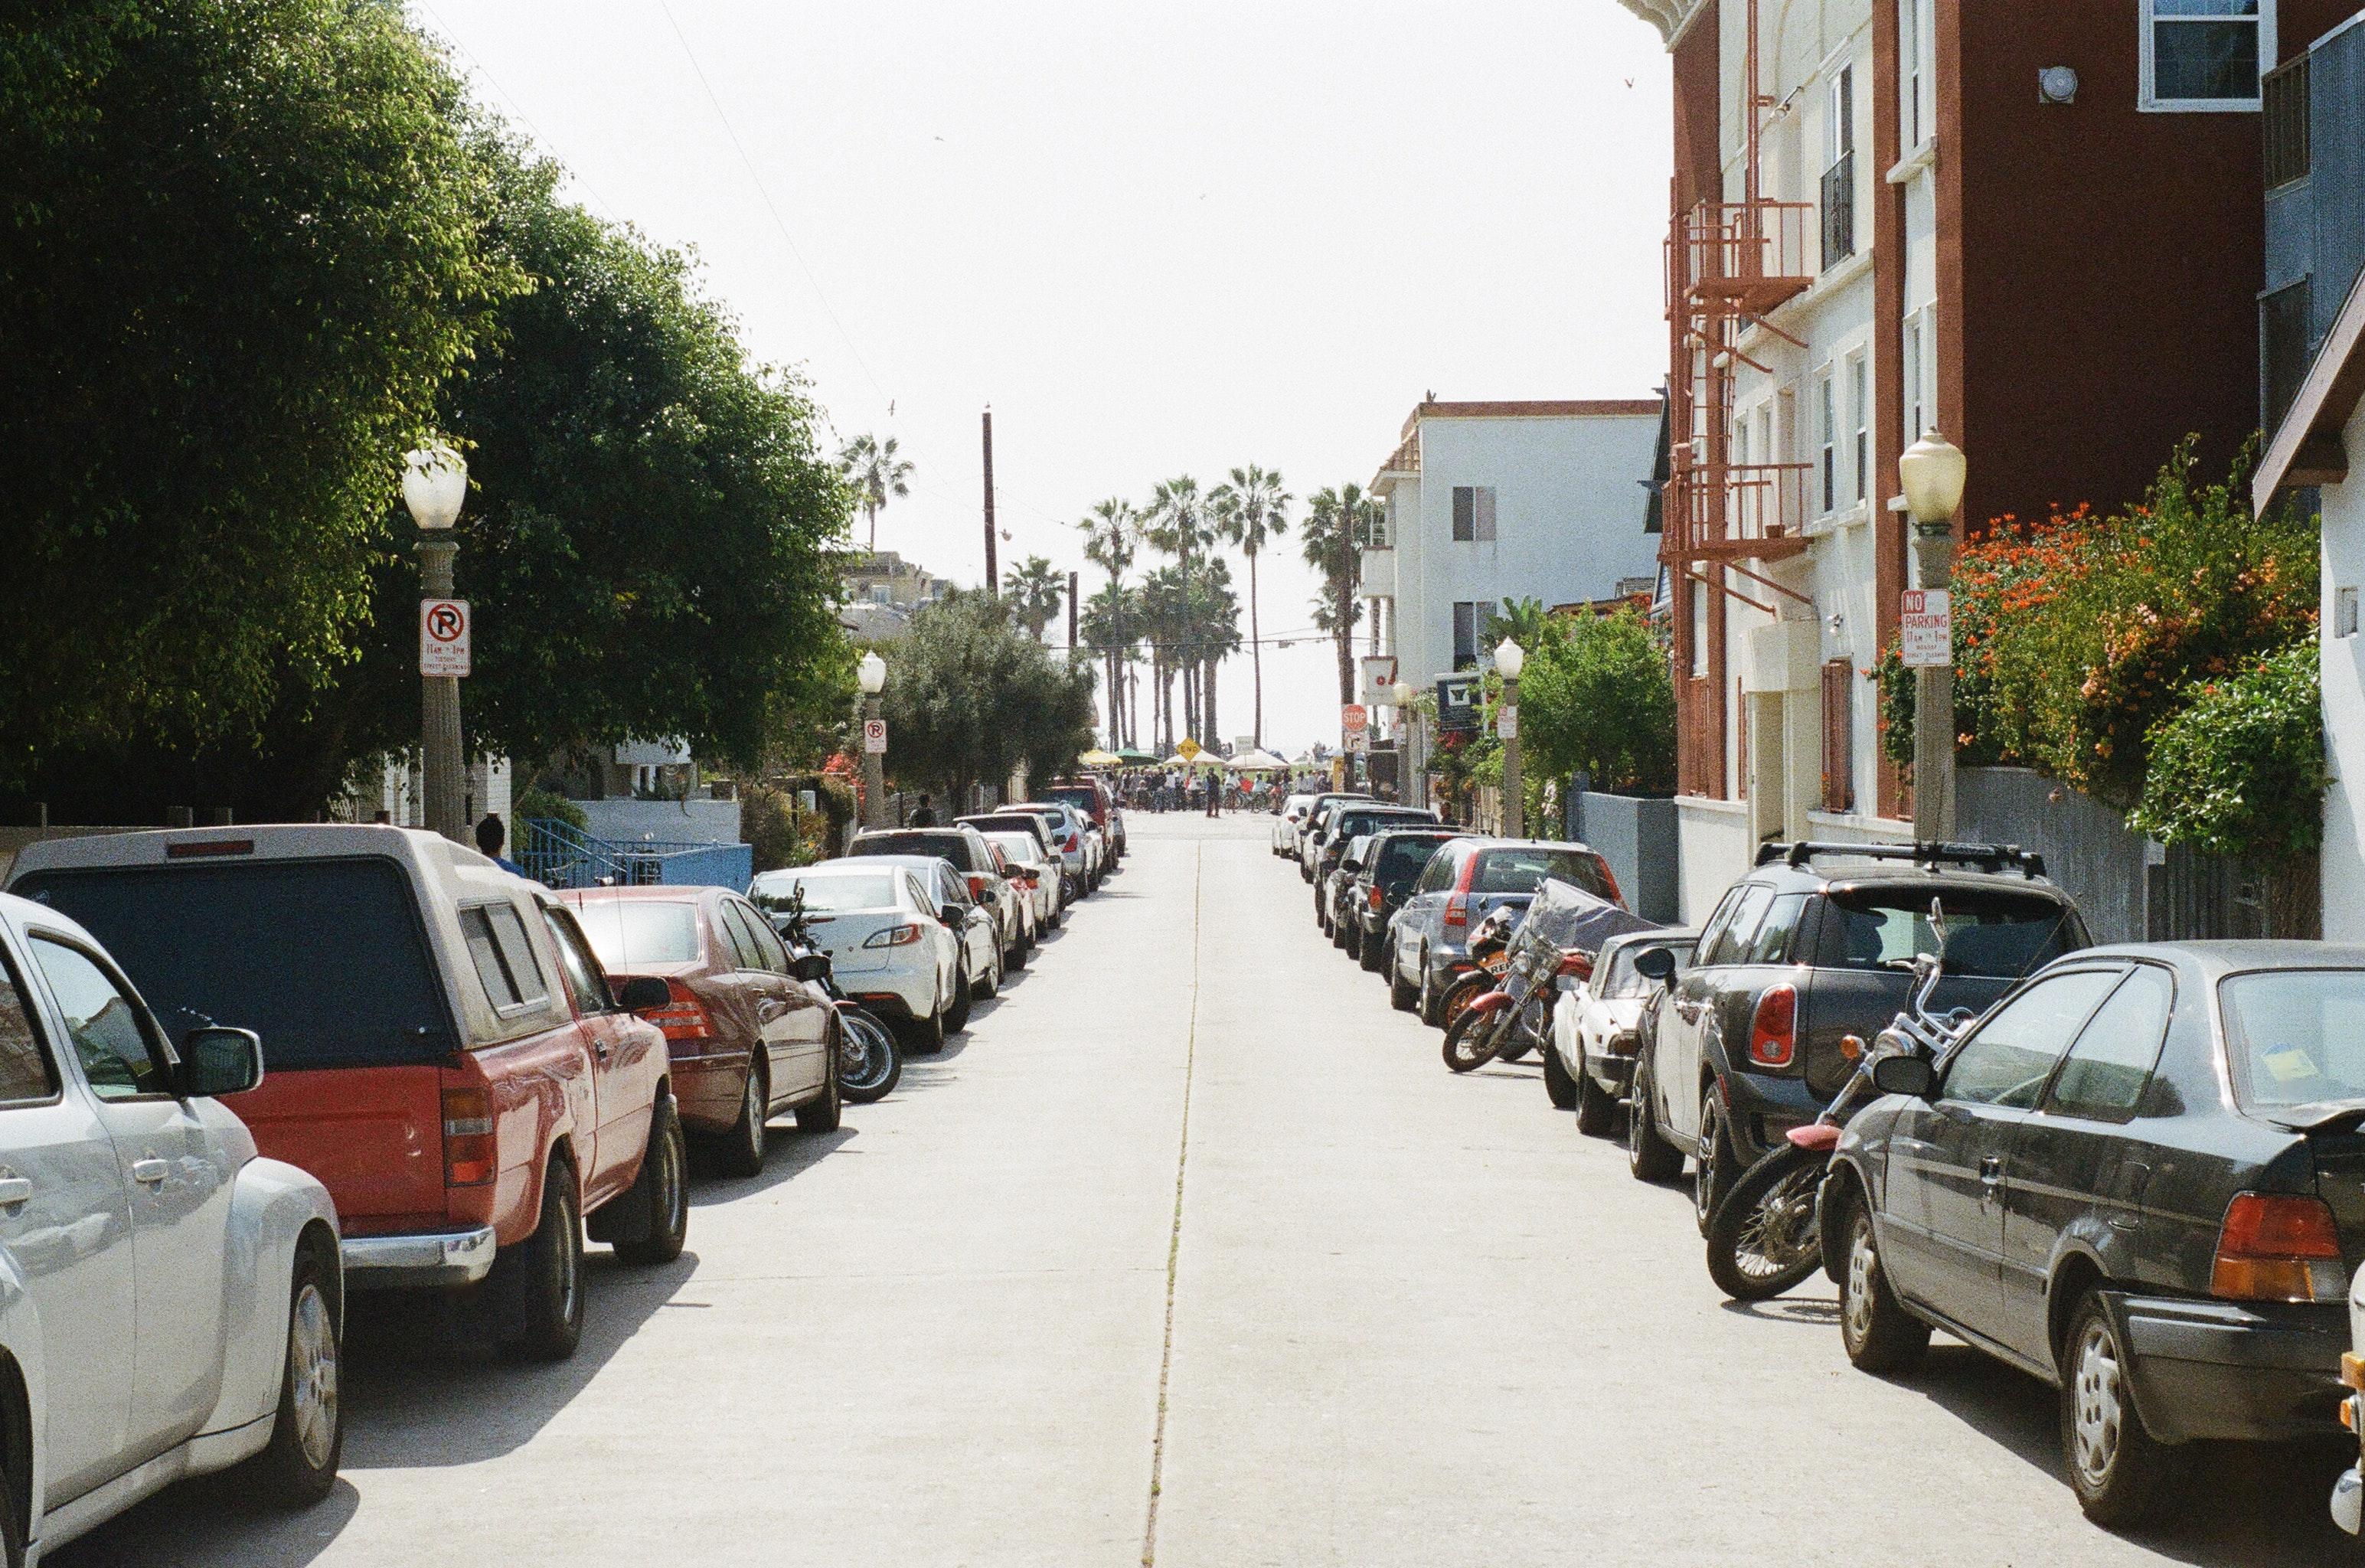 cars-parking-street-2647.jpg